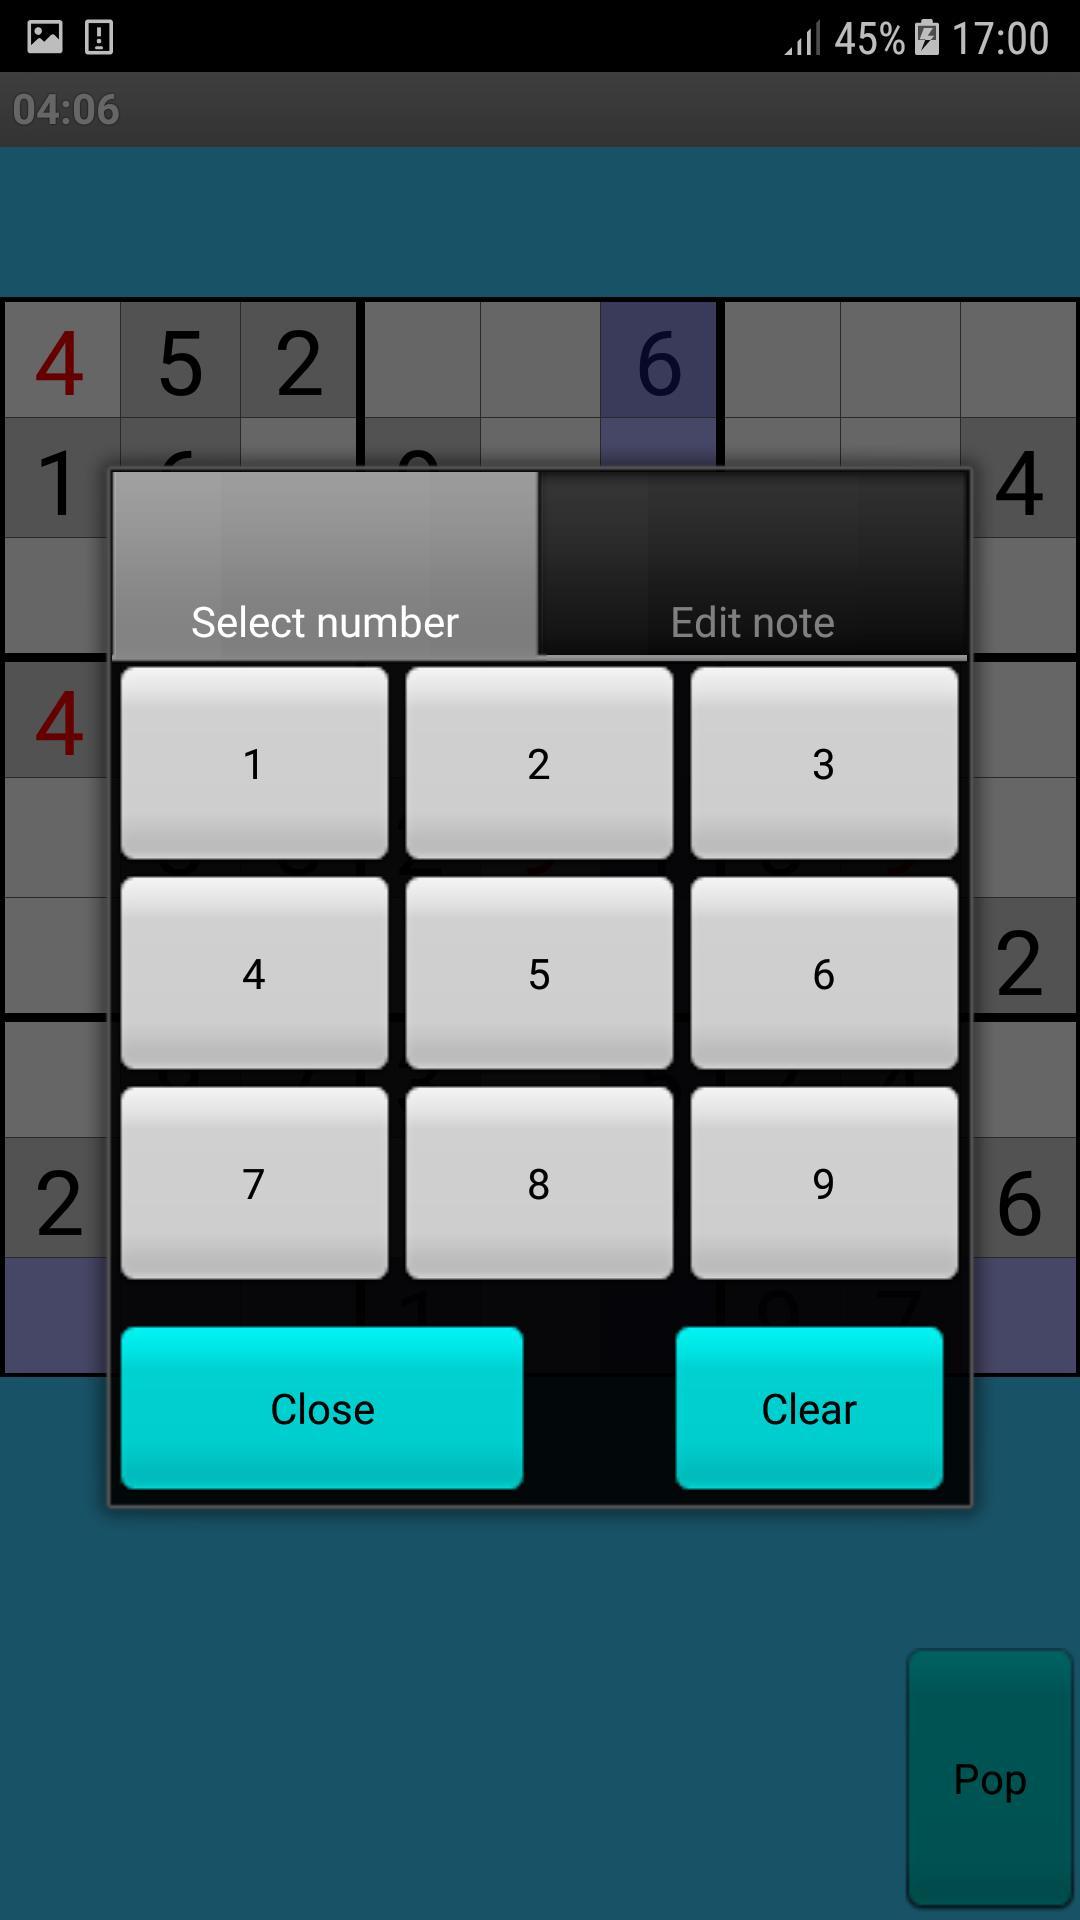 Sudoku Для Андроид - Скачать Apk pour Sudoku Junior À Imprimer